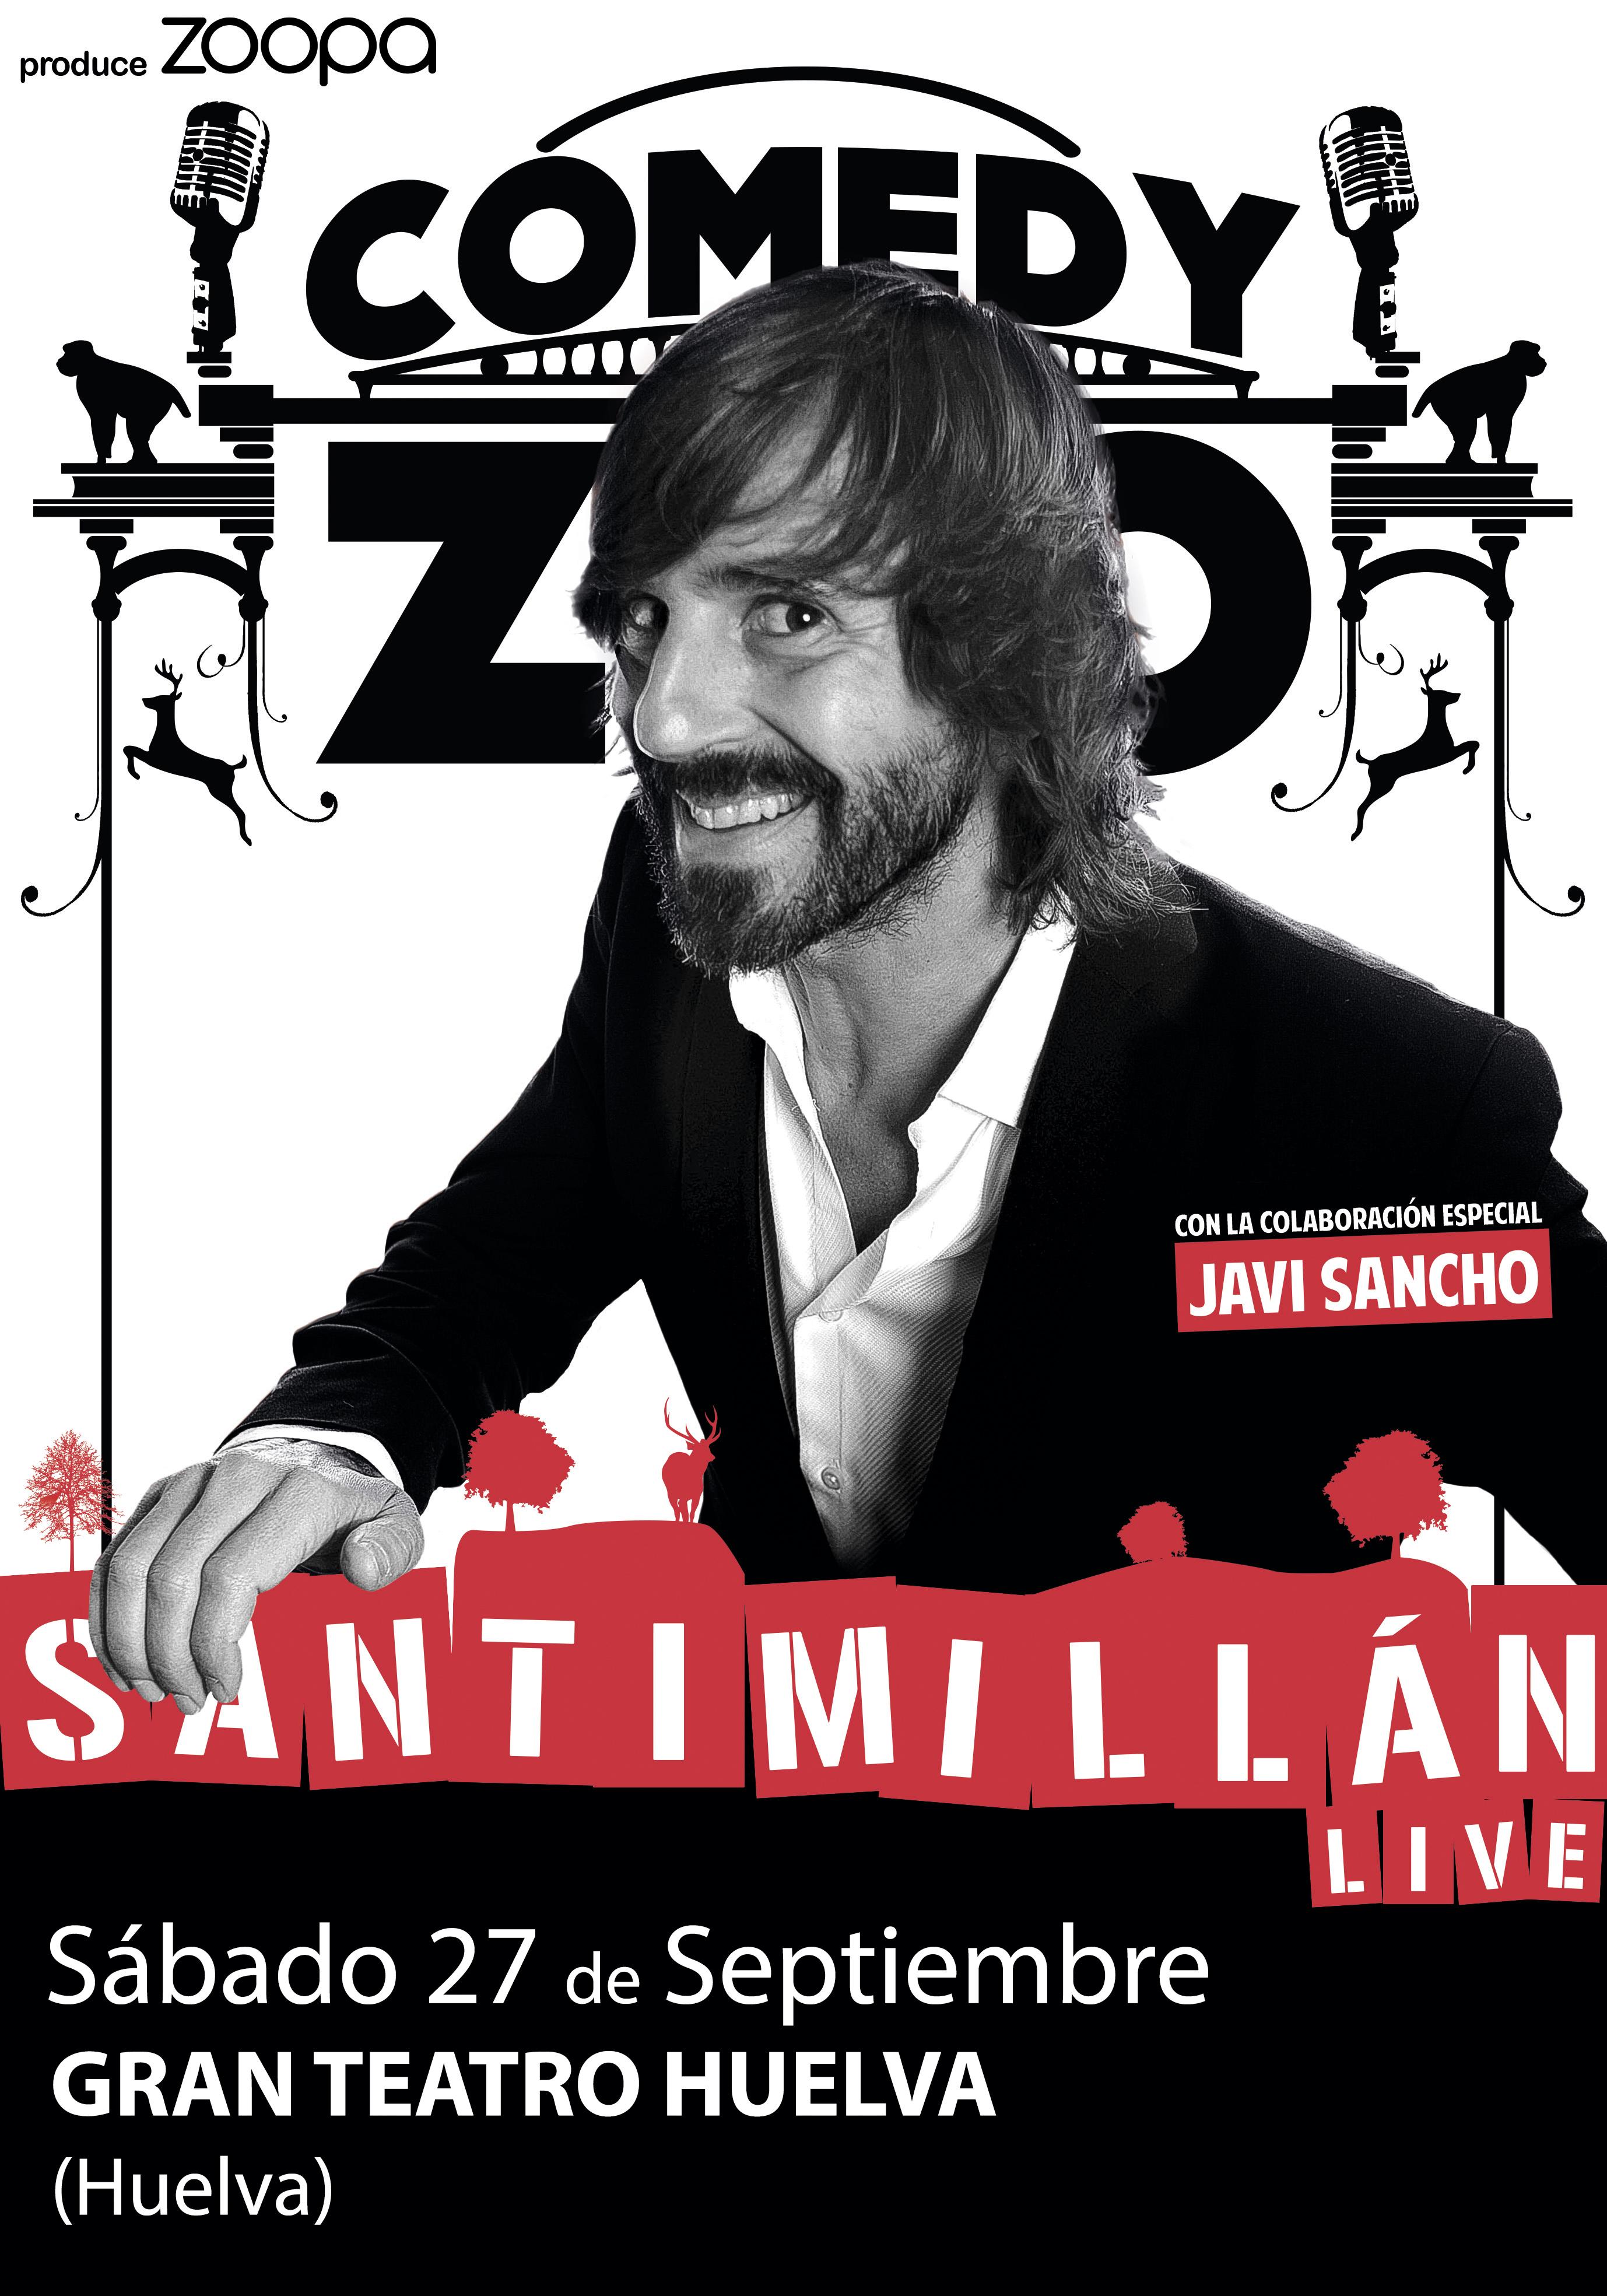 Santi Millán Live – Huelva